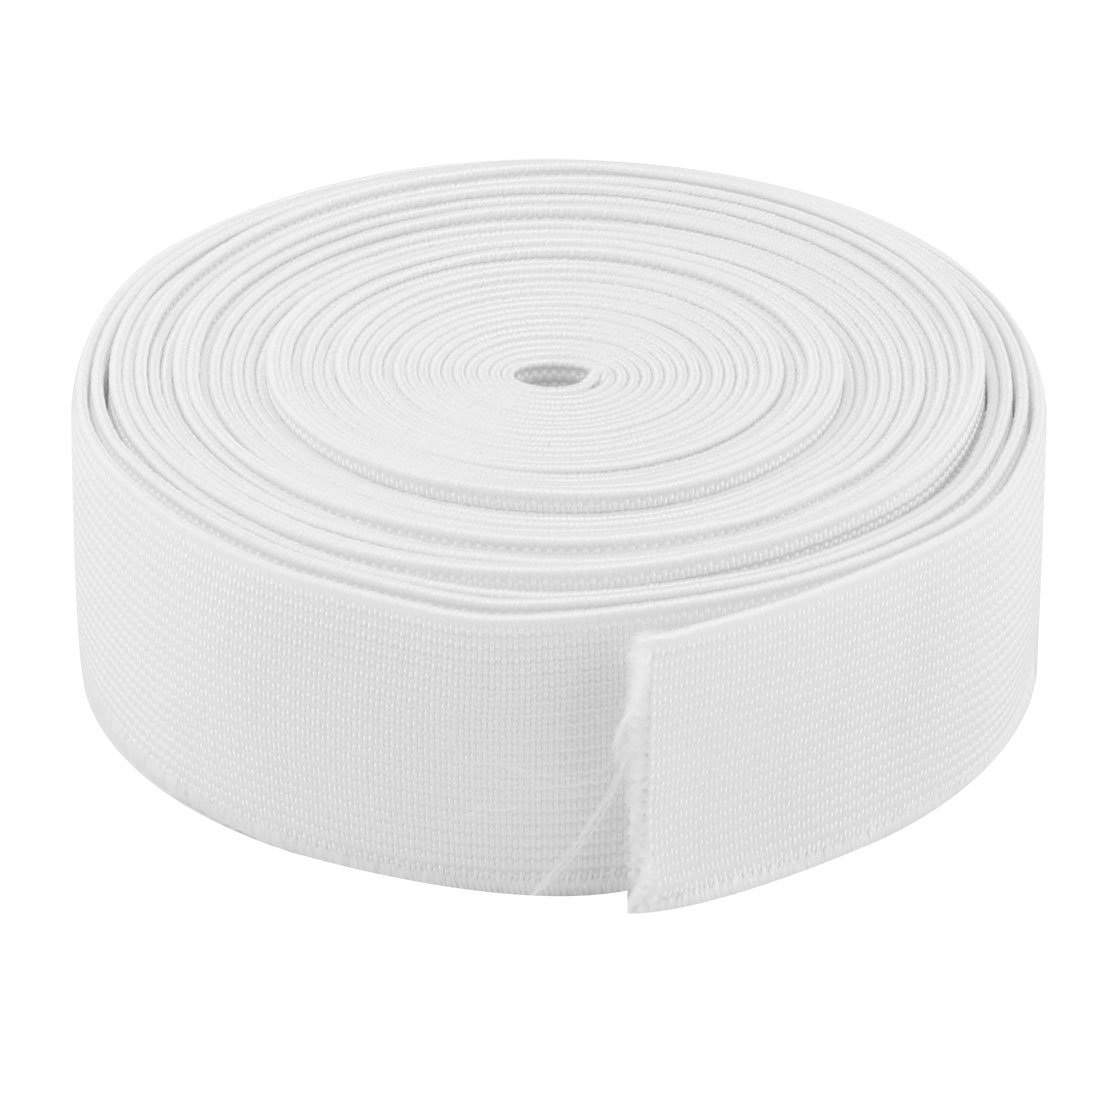 sourcing map Sartoria poliestere cucitura DIY gommoso elastico intrecciato banda bianca corda 6 metri